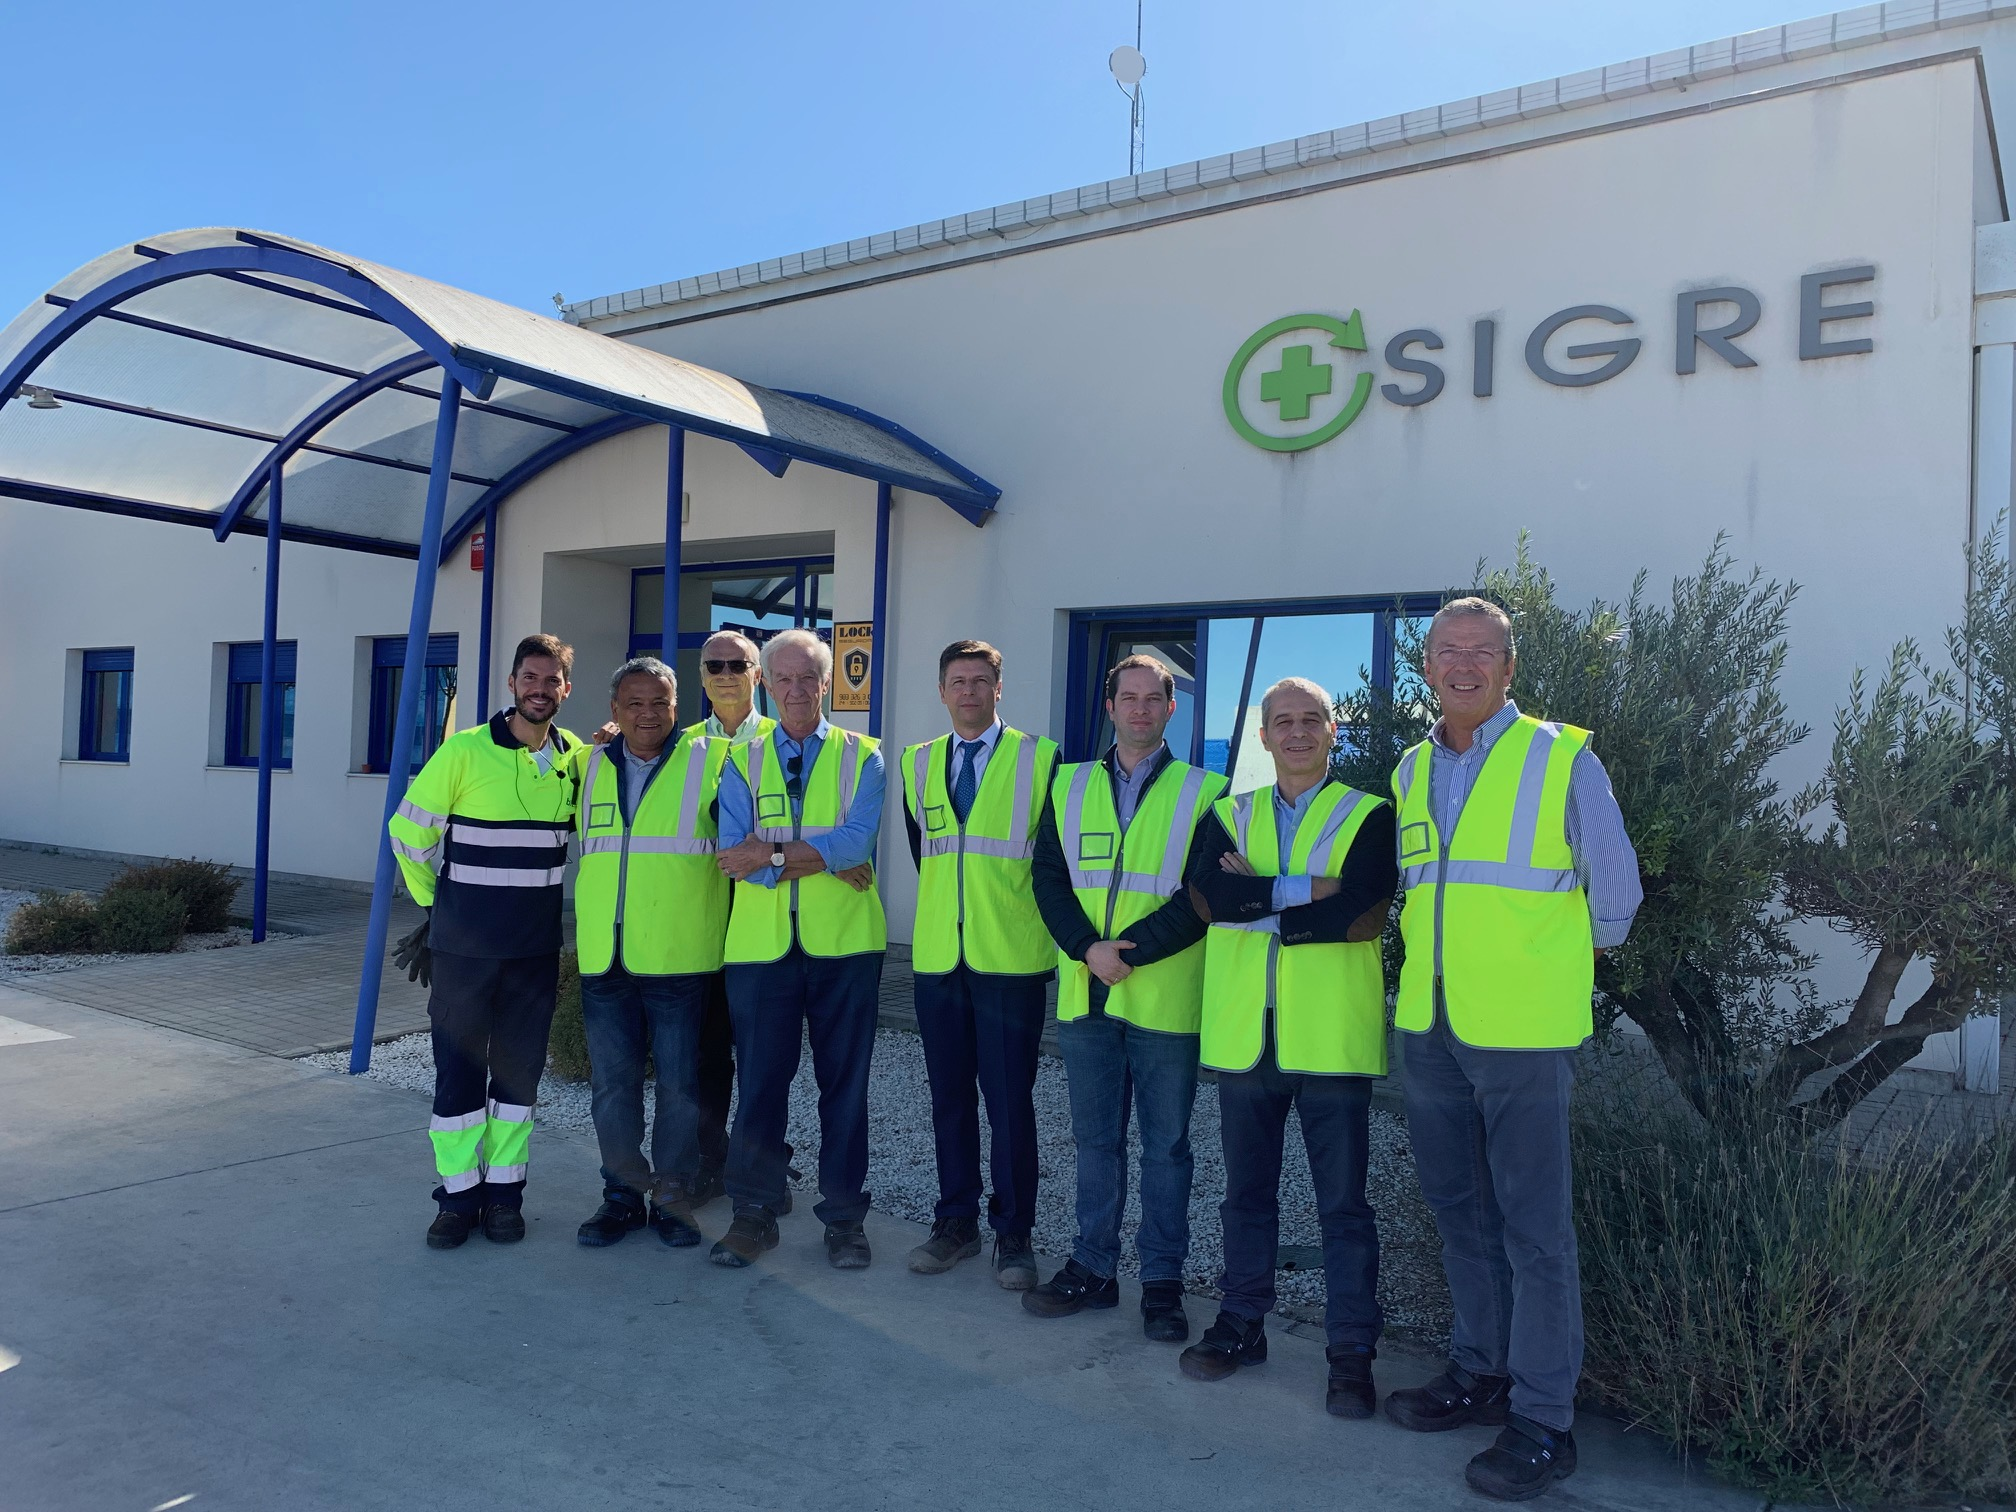 Foto nº1-Visita Planta Biotran-RIPPM (10.10.2019)